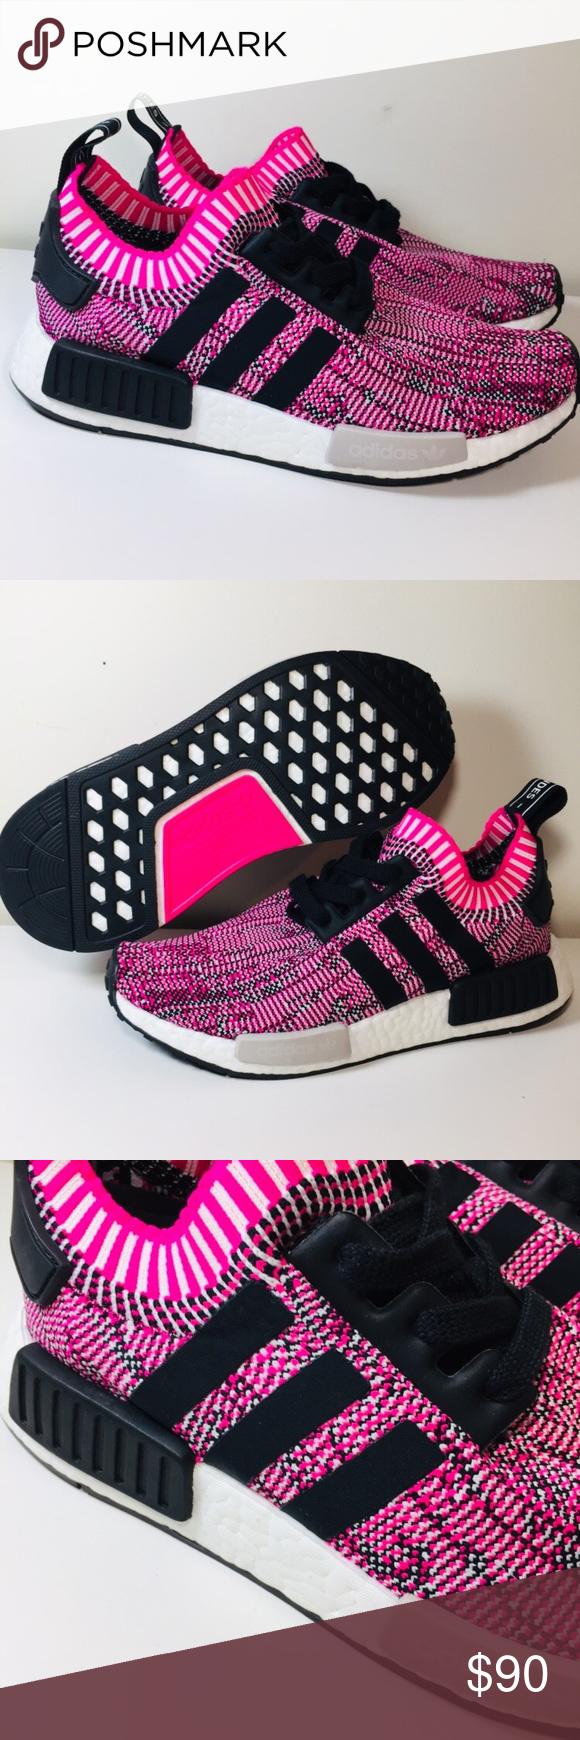 5d368506c Adidas NMD R1 PK Primeknit Boost sneaker Pink Rose New Adidas Womens NMD R1  PK Primeknit